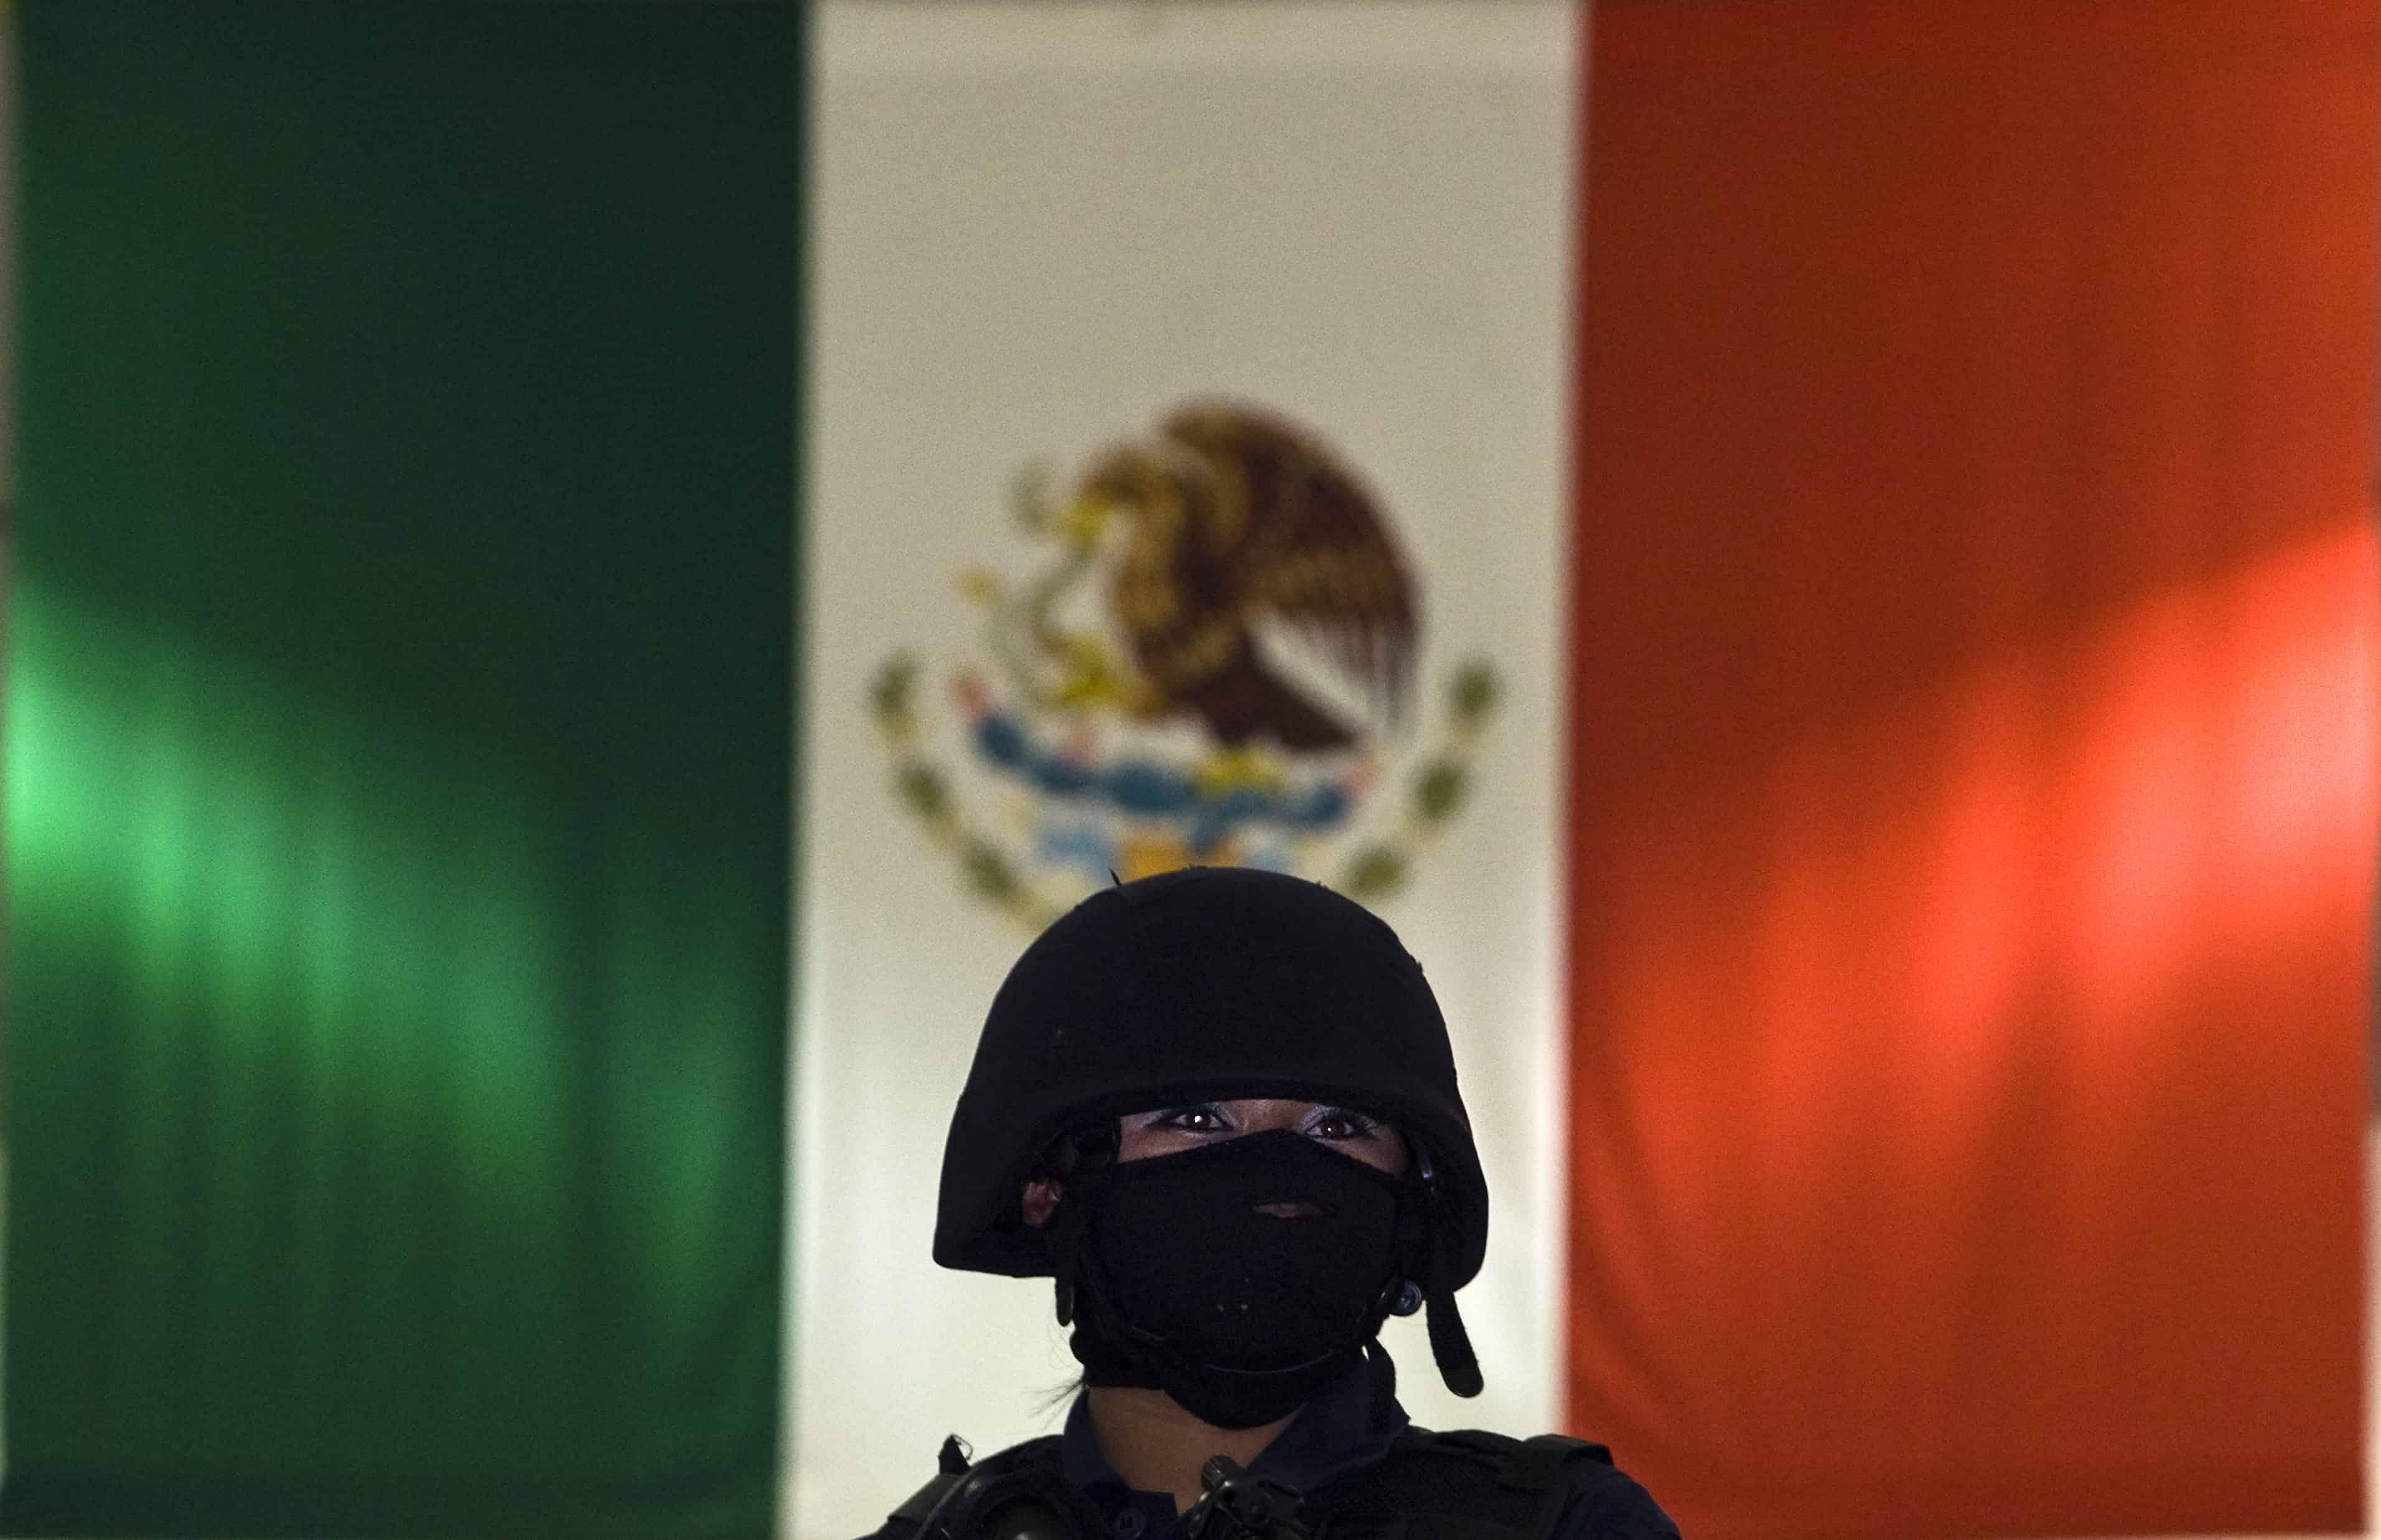 Sinaloa drug cartel lives on despite 'CEO' El Chapo's capture – The